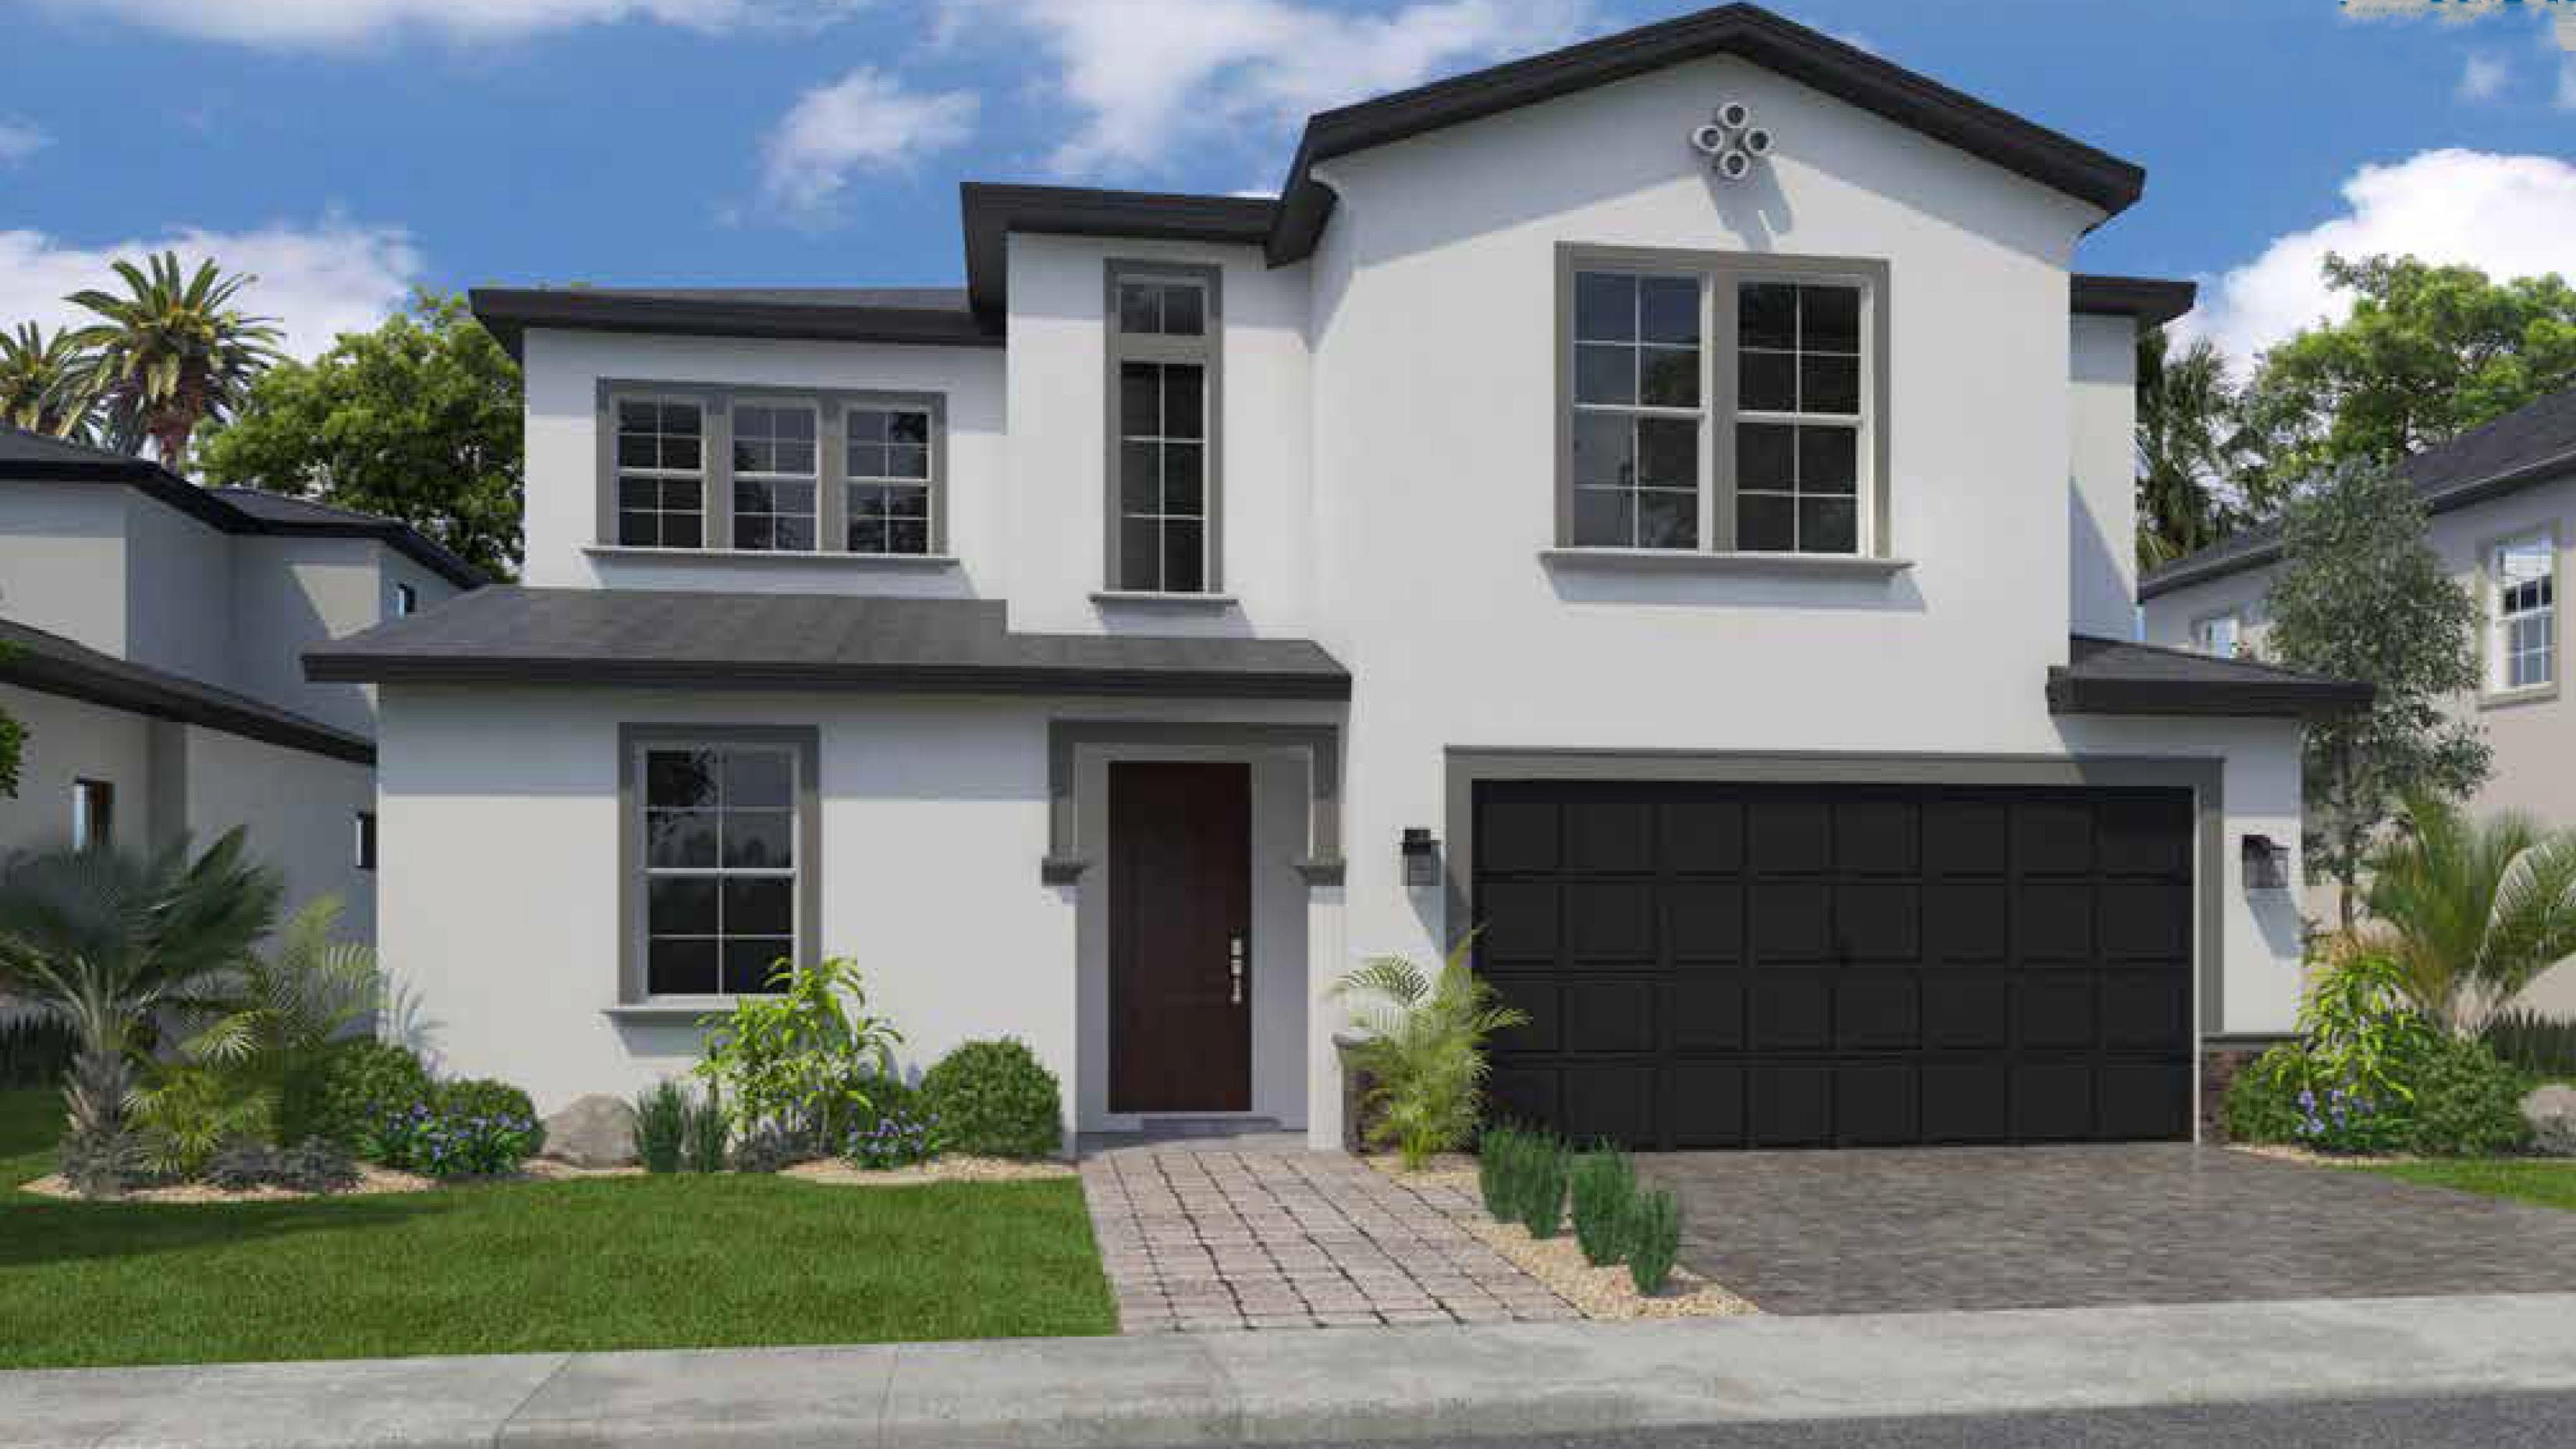 San Remo Home | Modern Home Designs in Orlando, FL